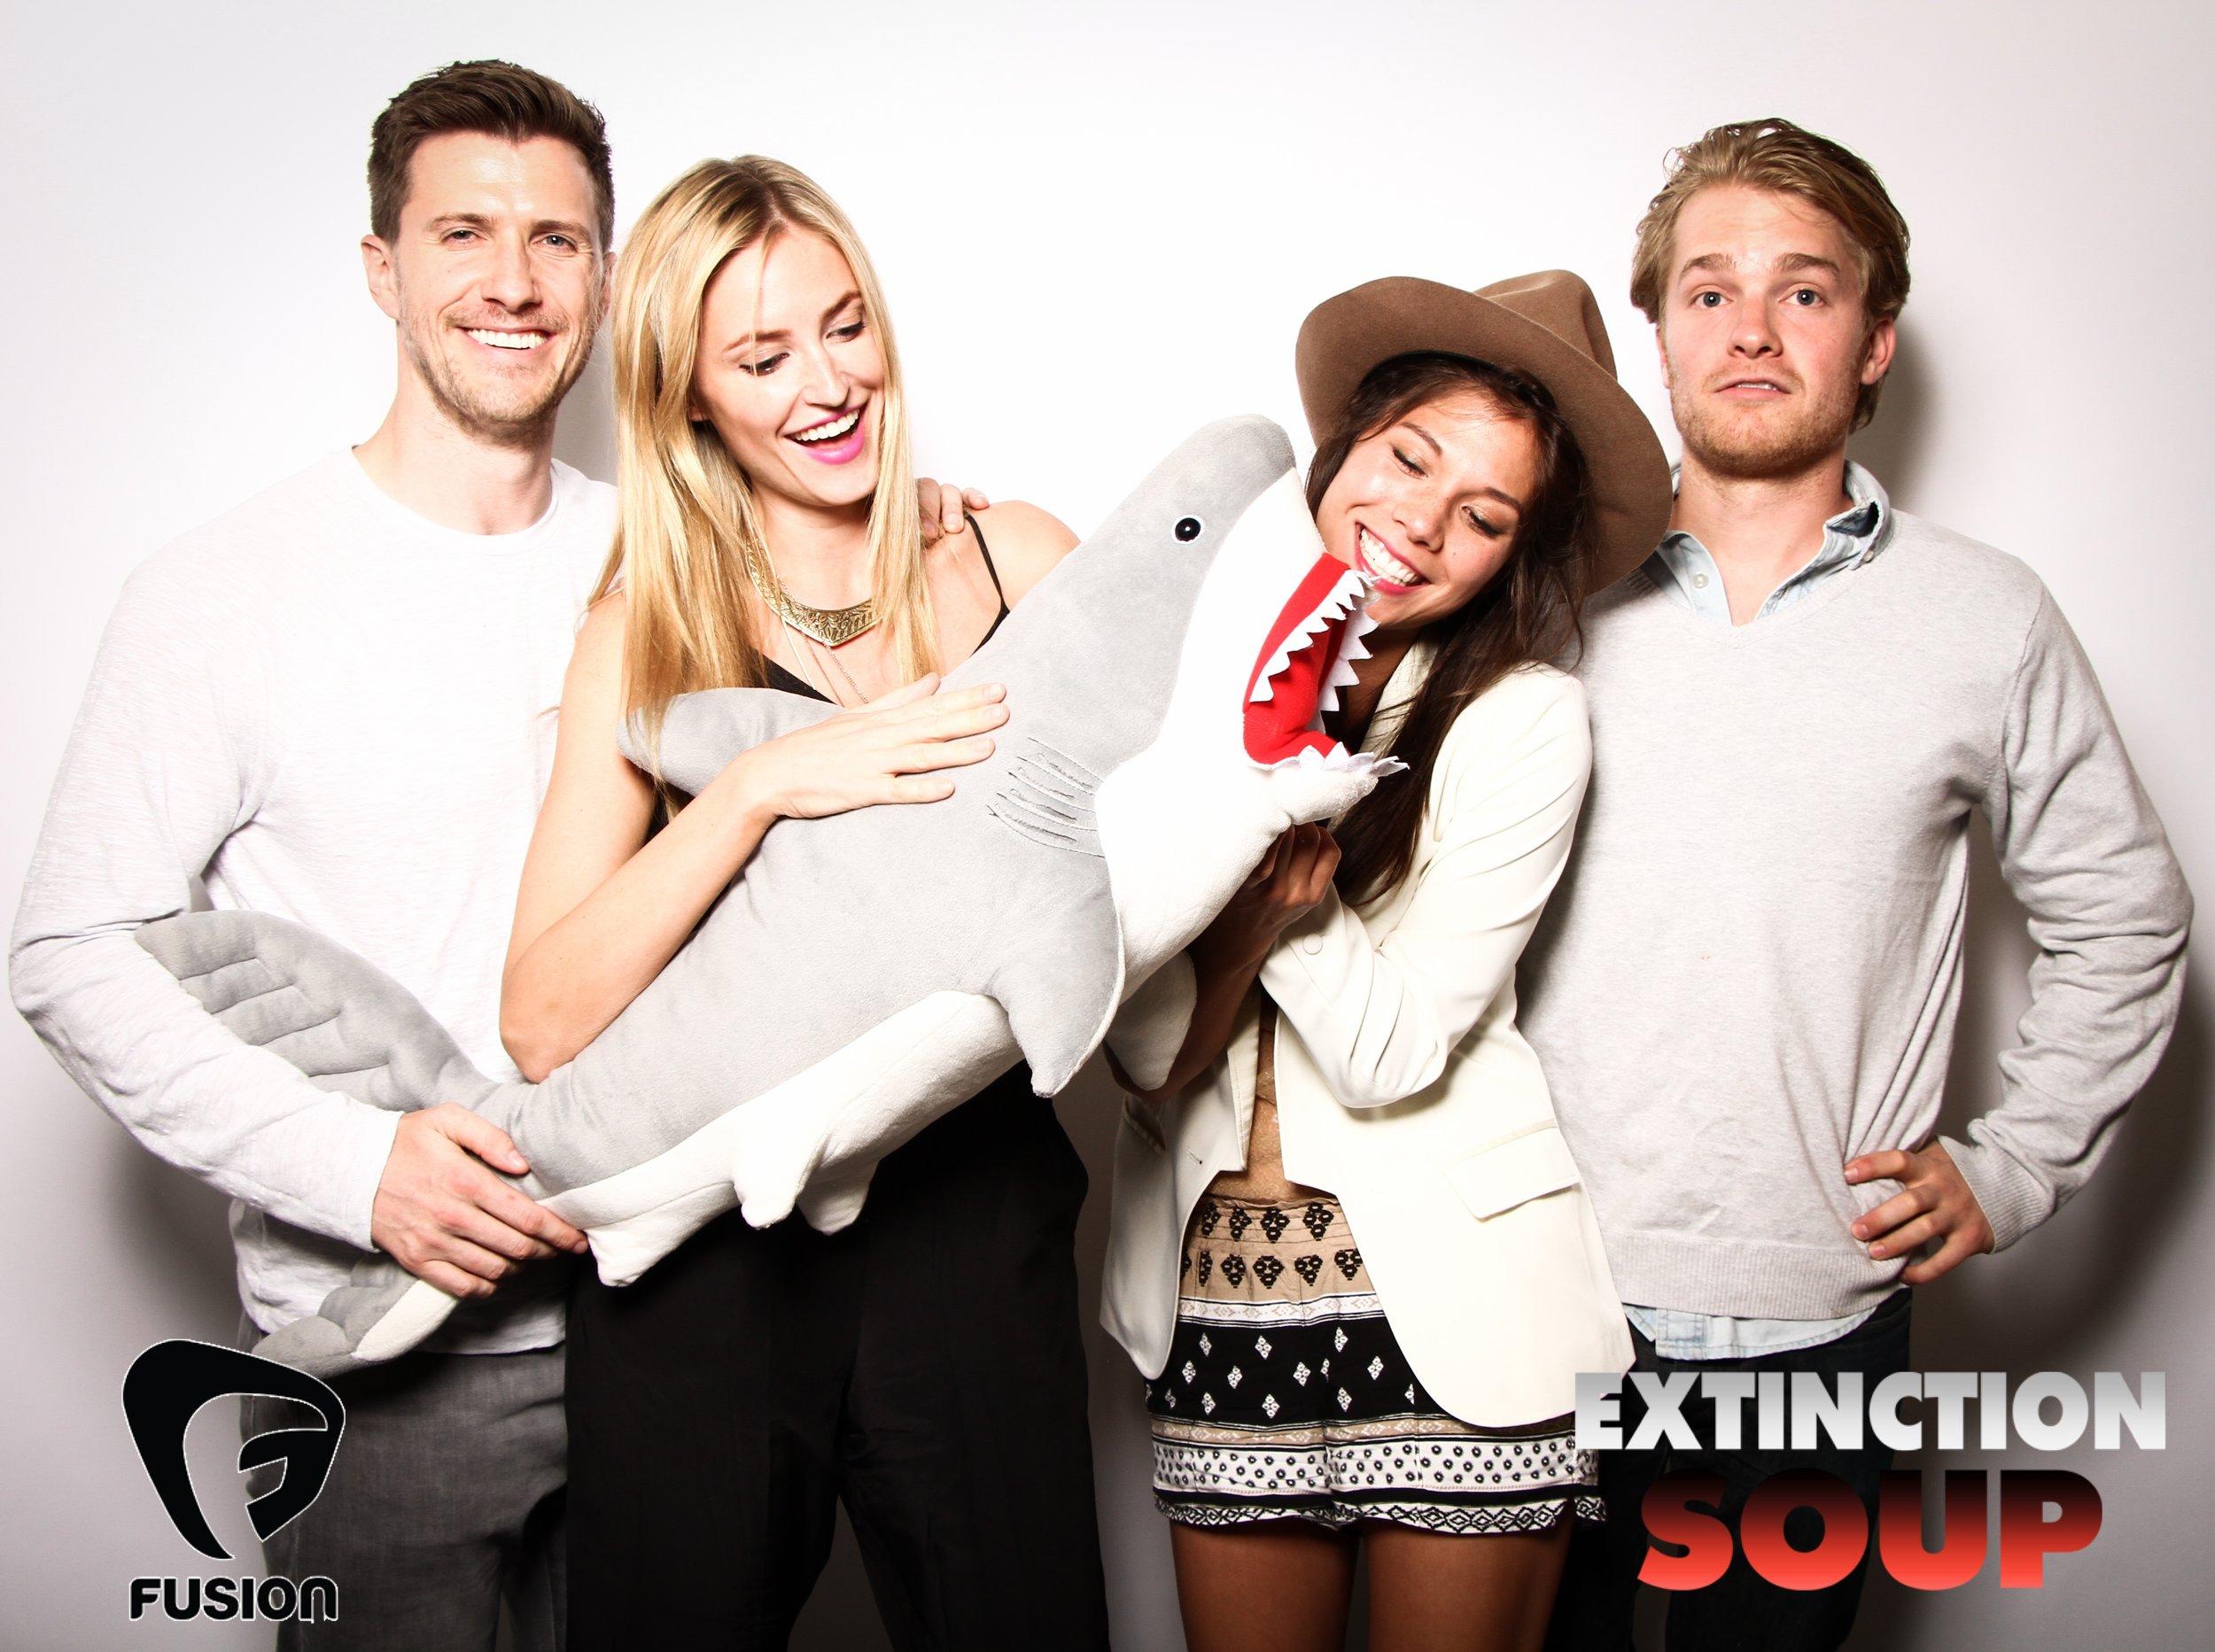 Photo booth fun with shark 2